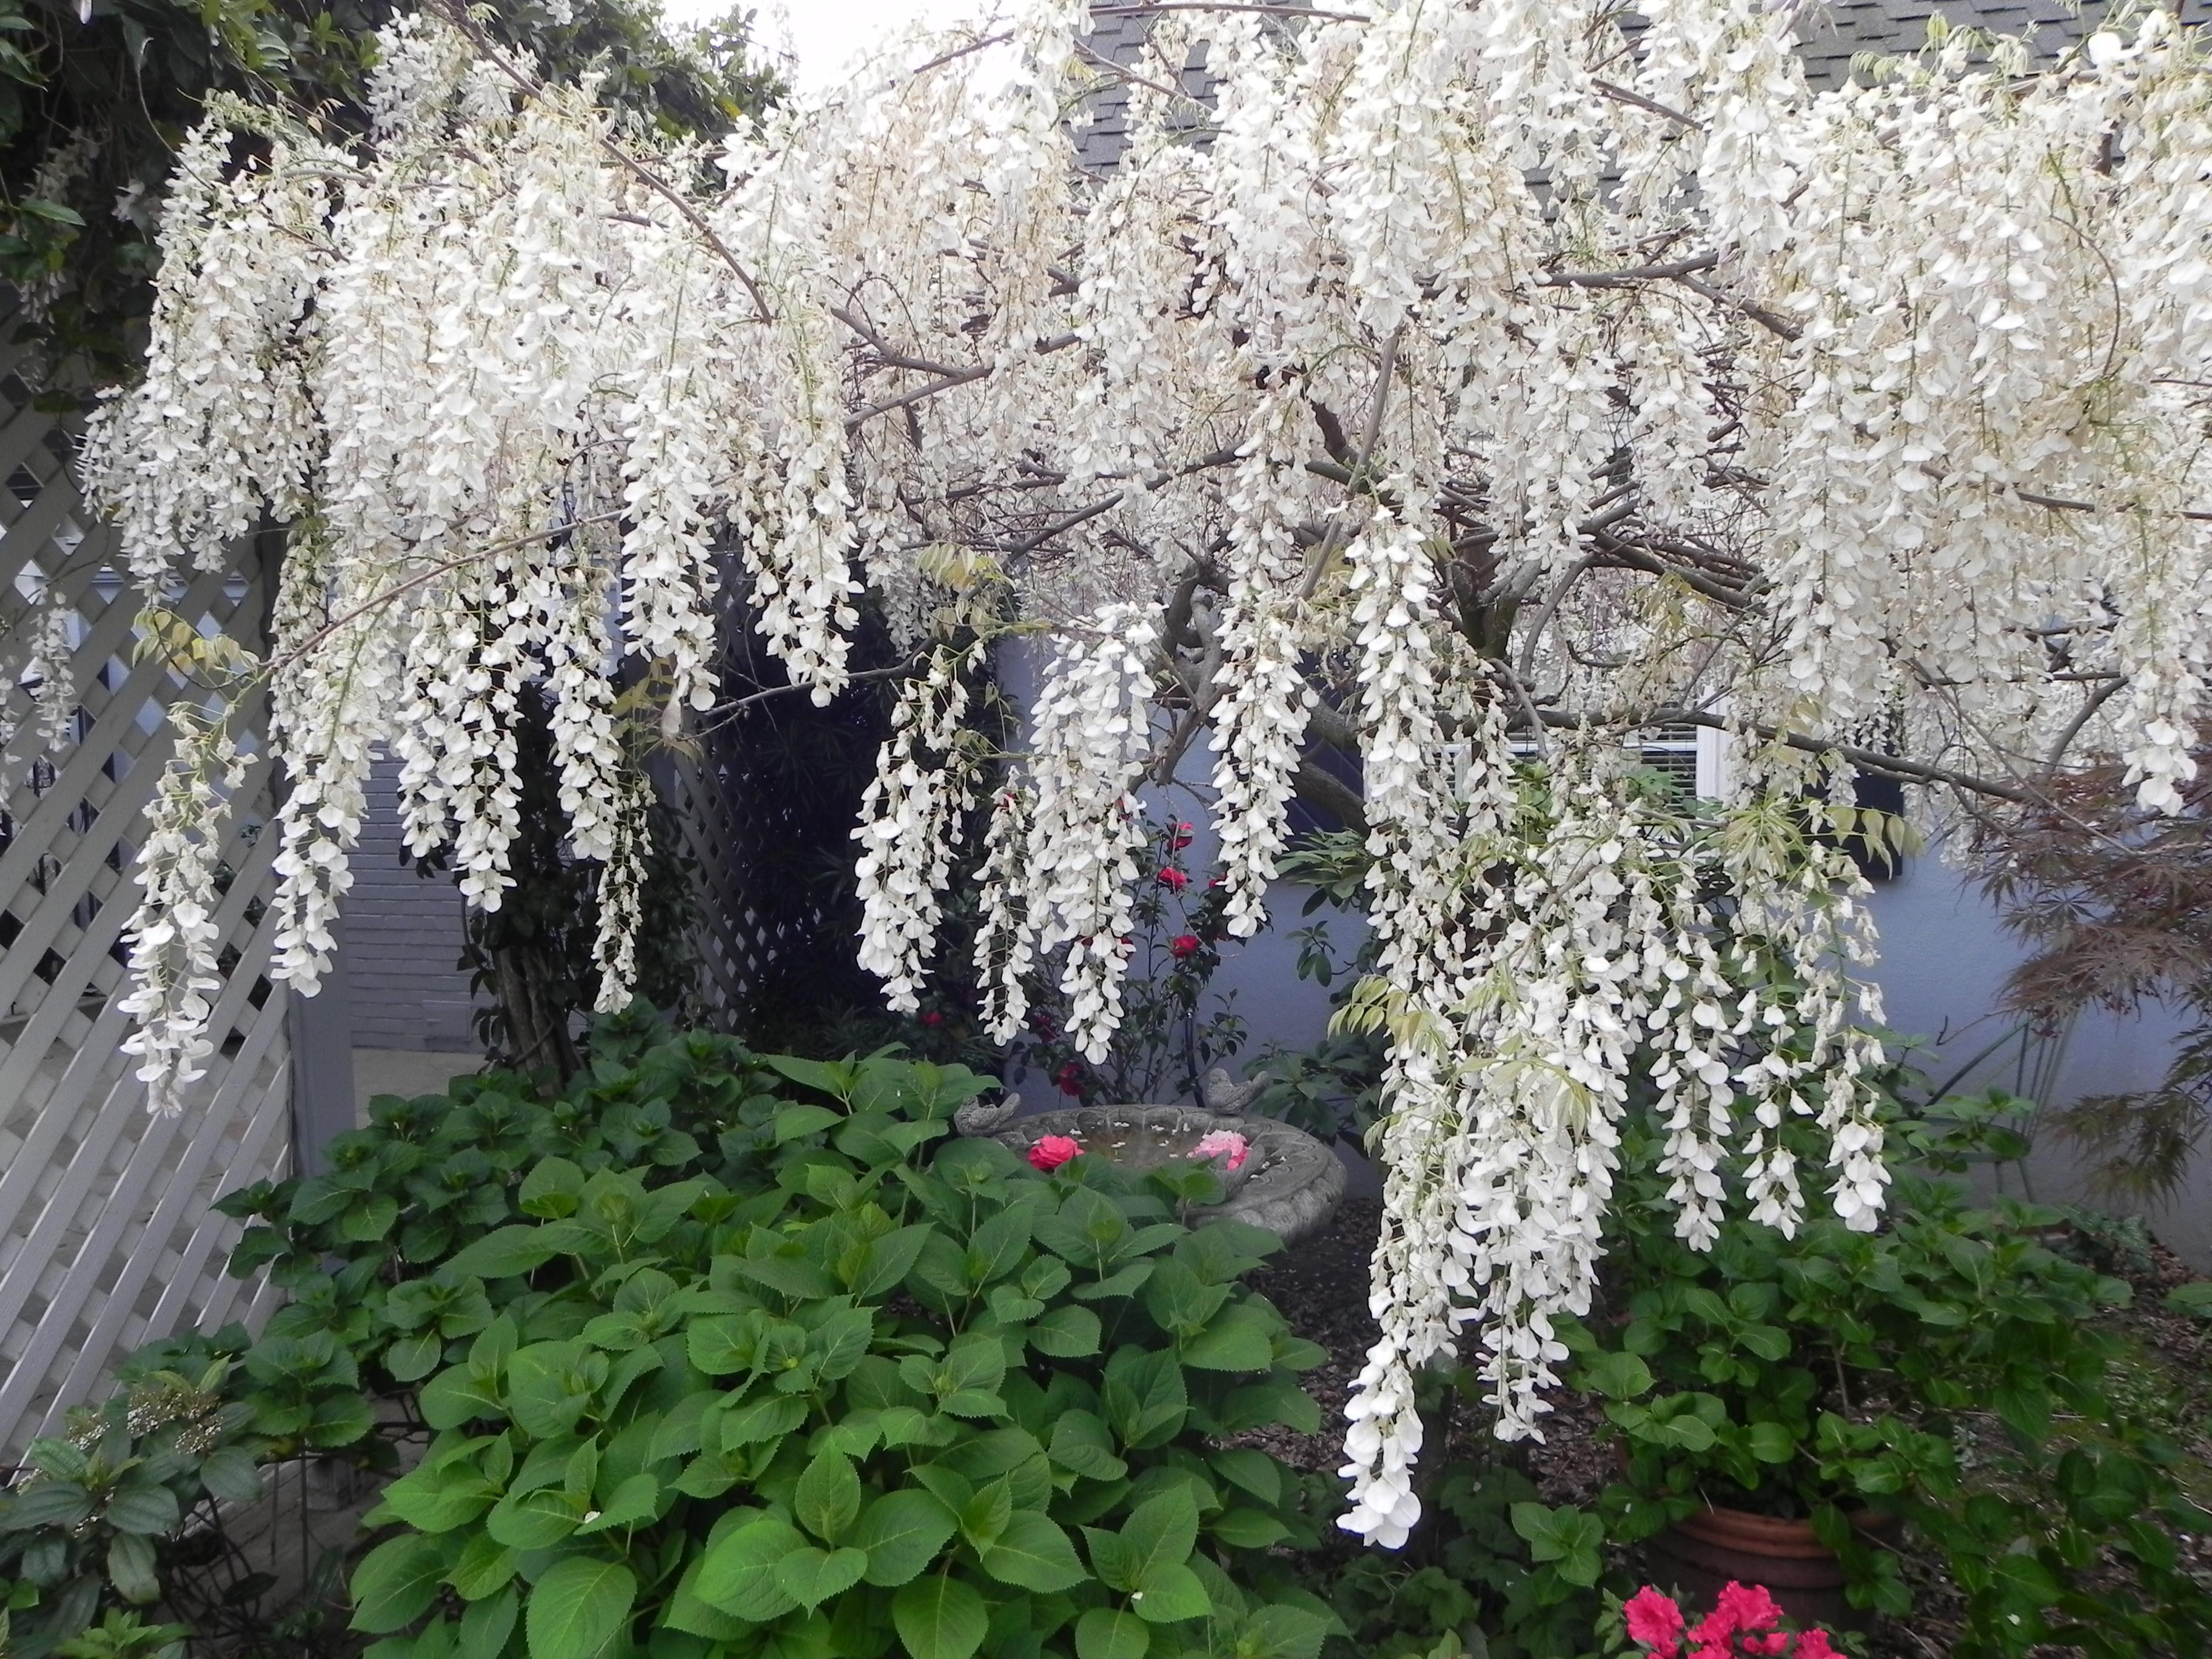 Fine cascading white flowers ensign wedding and flowers ispiration enchanting cascading white flowers inspiration wedding and flowers mightylinksfo